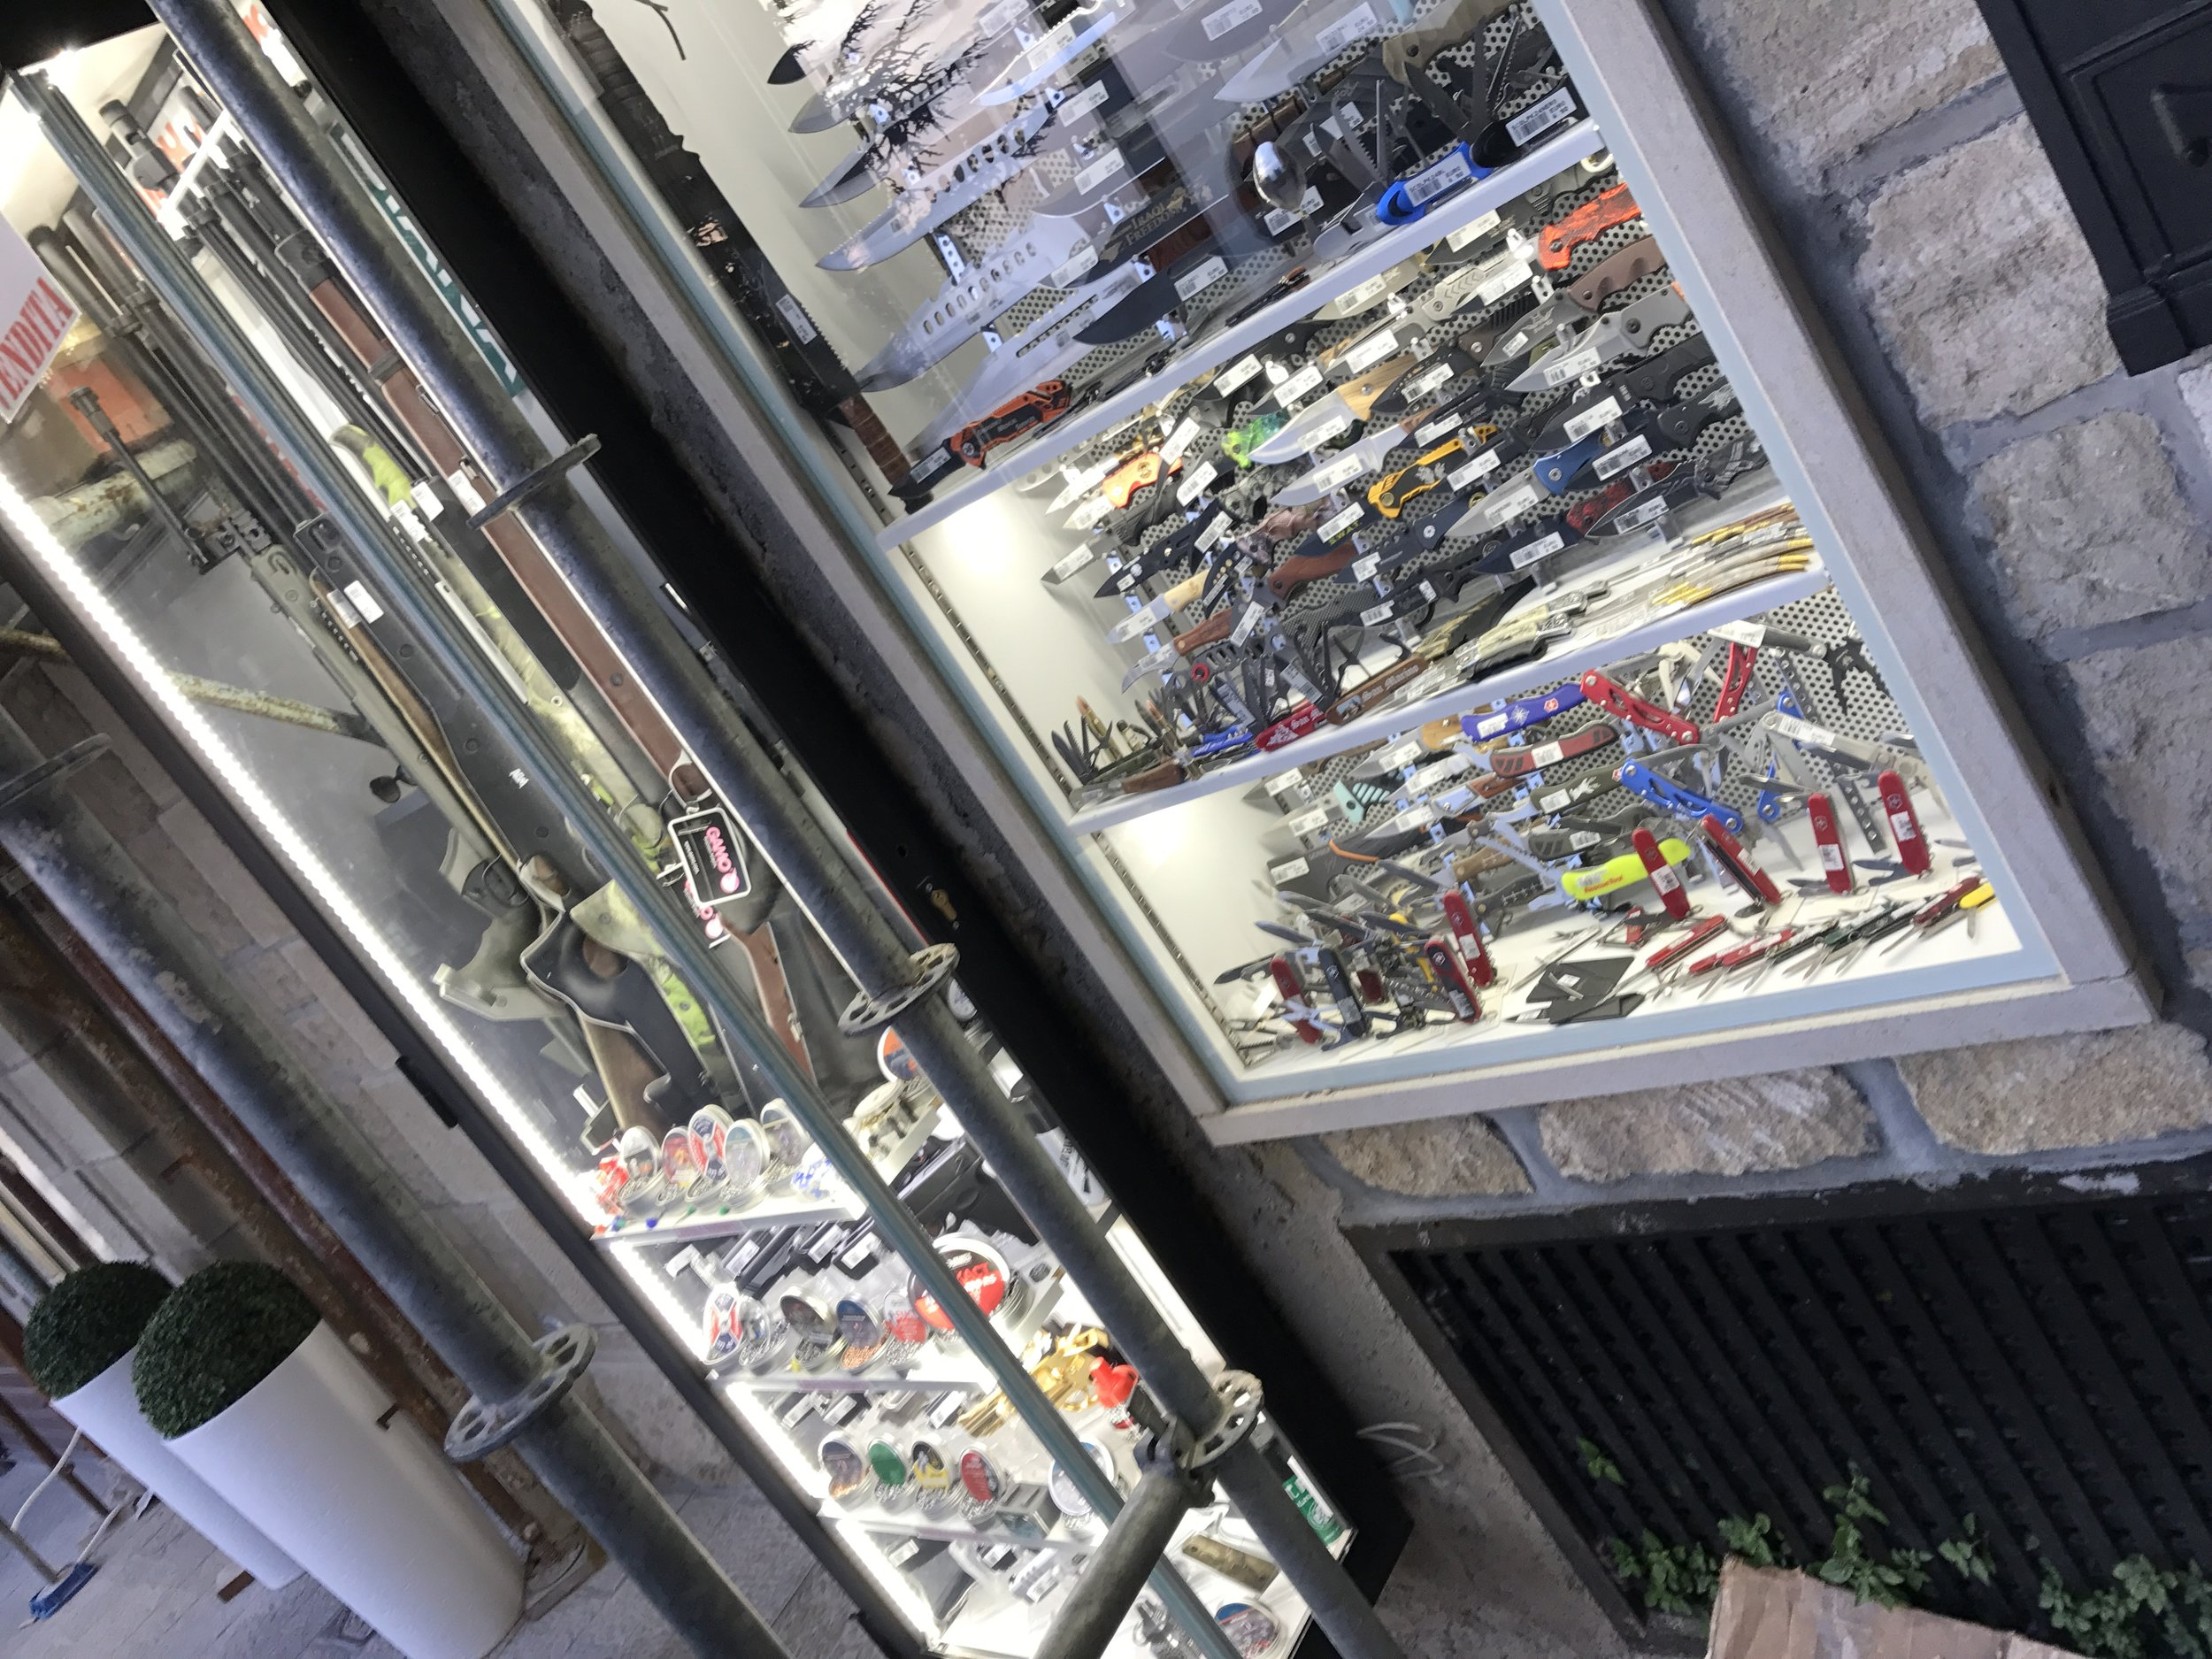 San-Marino-Knife-Shop-Store